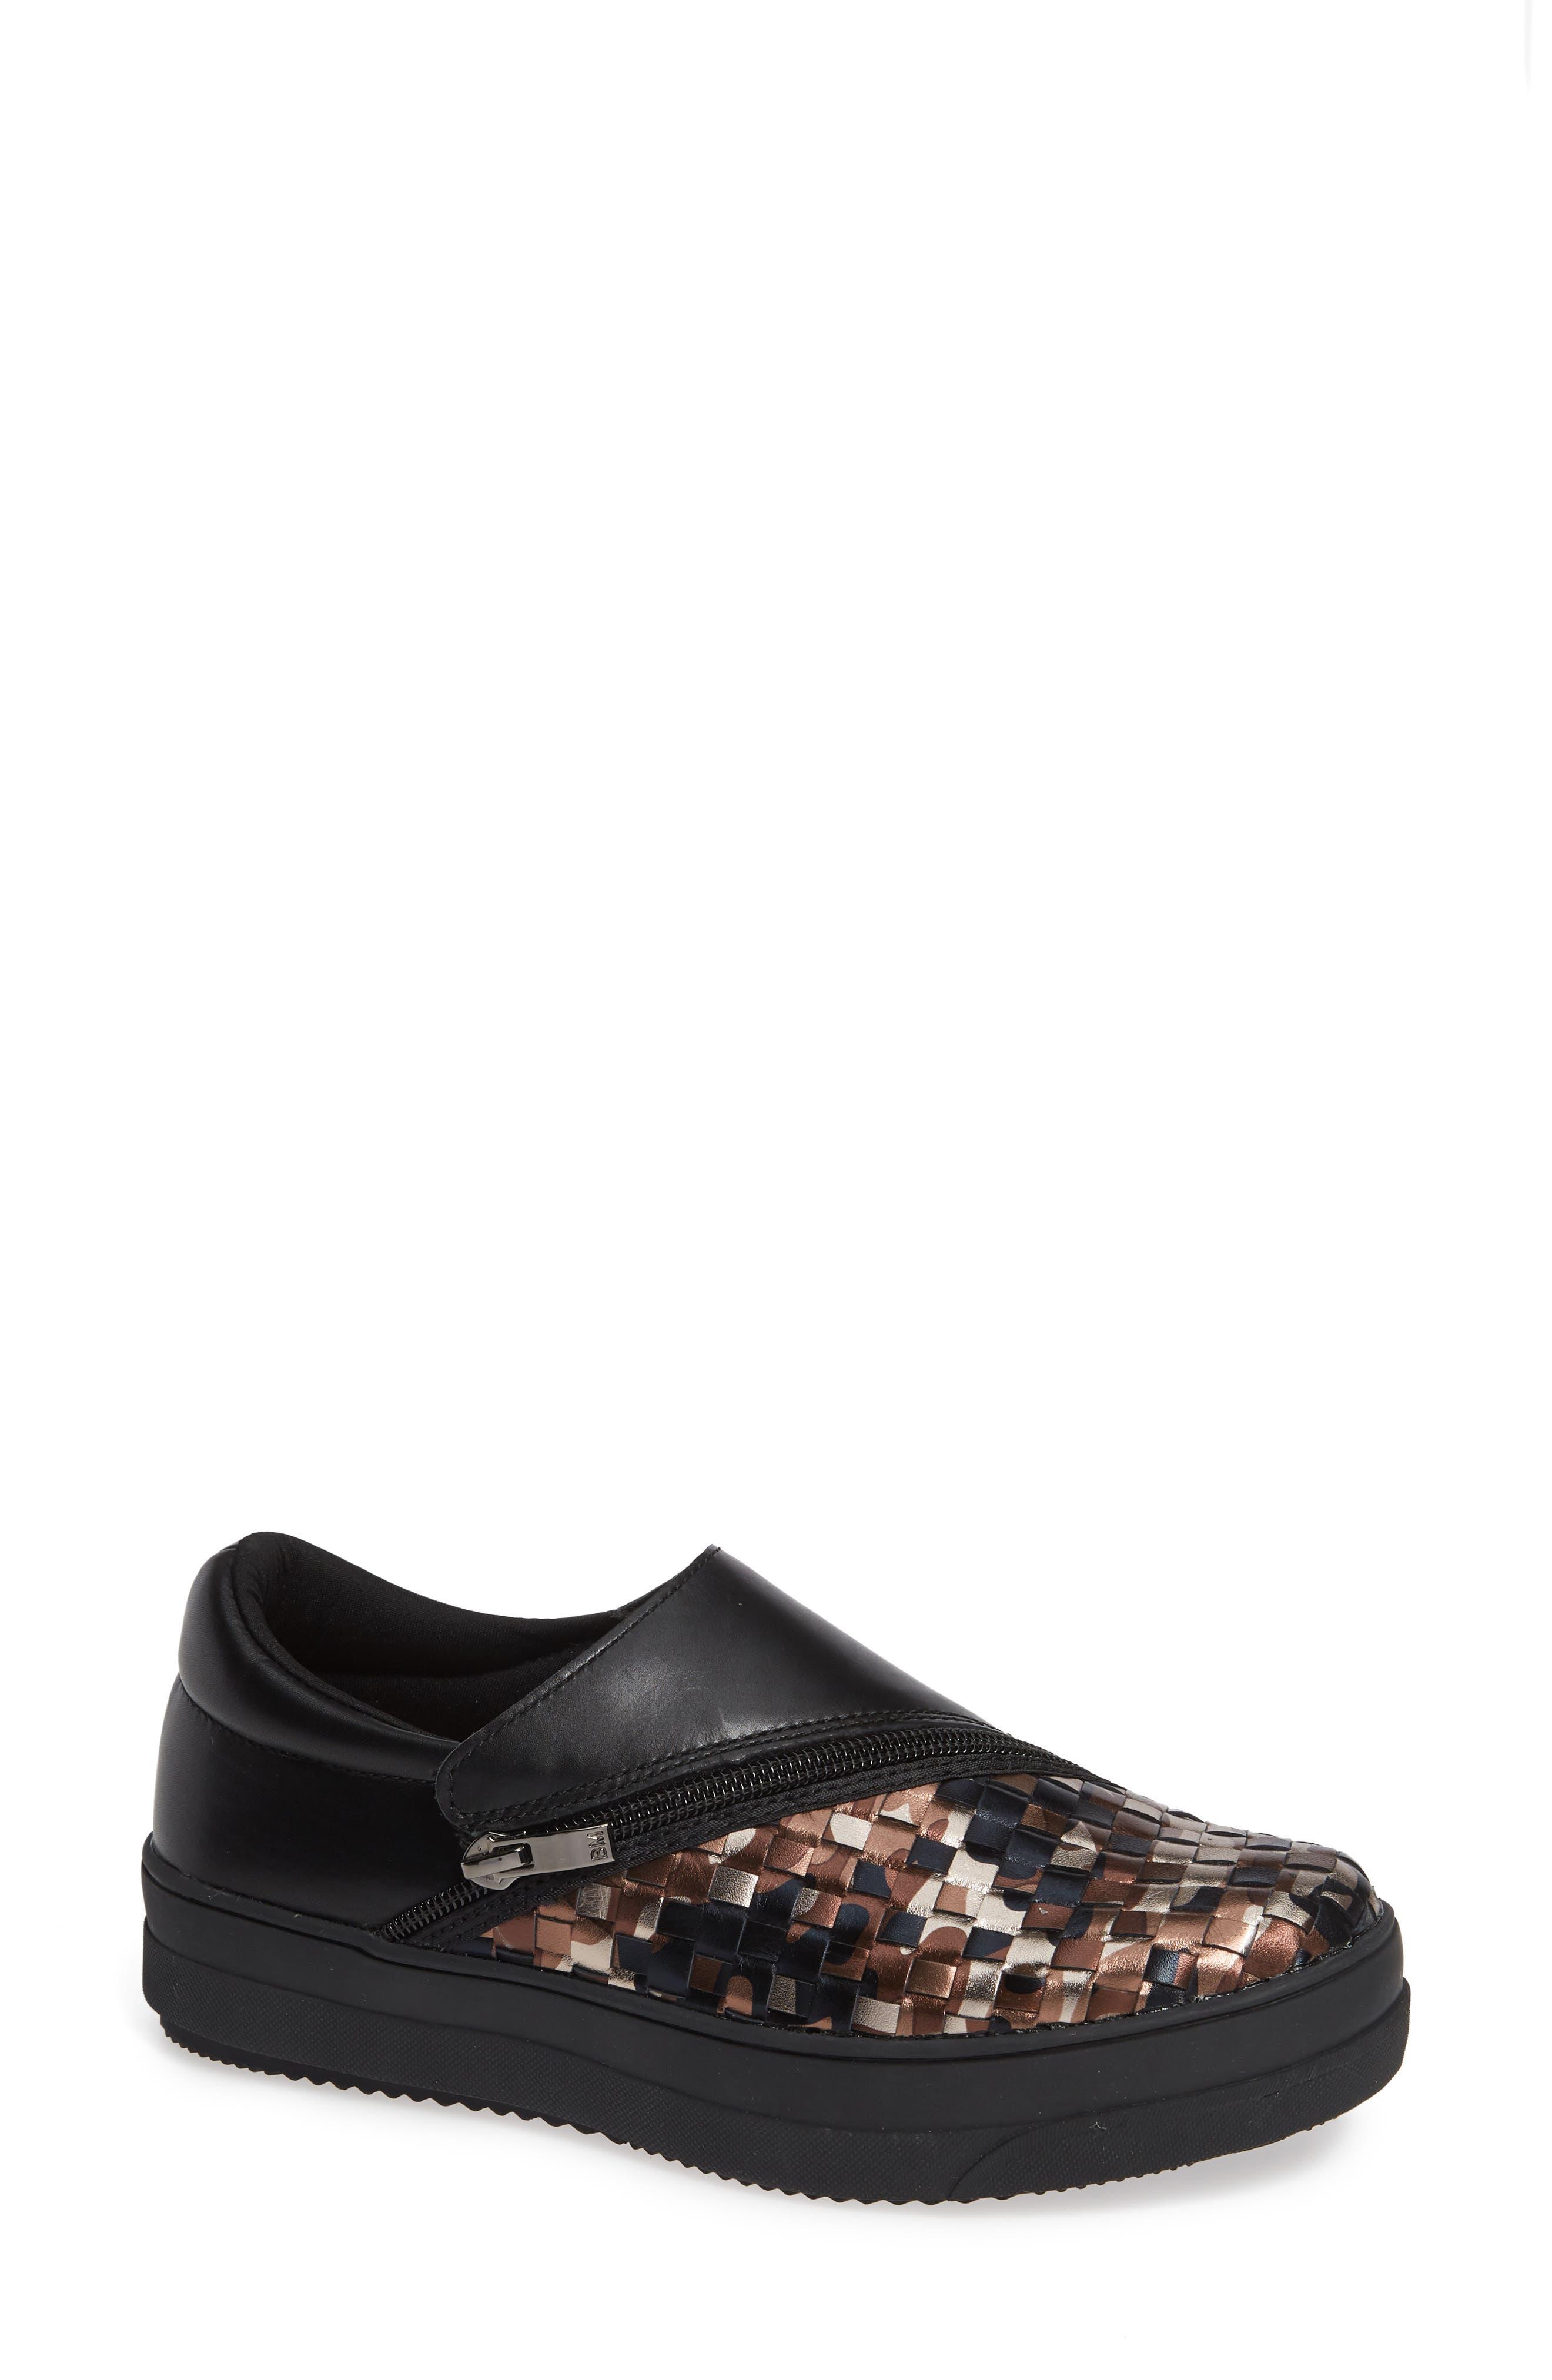 Bernie Mev Michelle Sneaker, Black